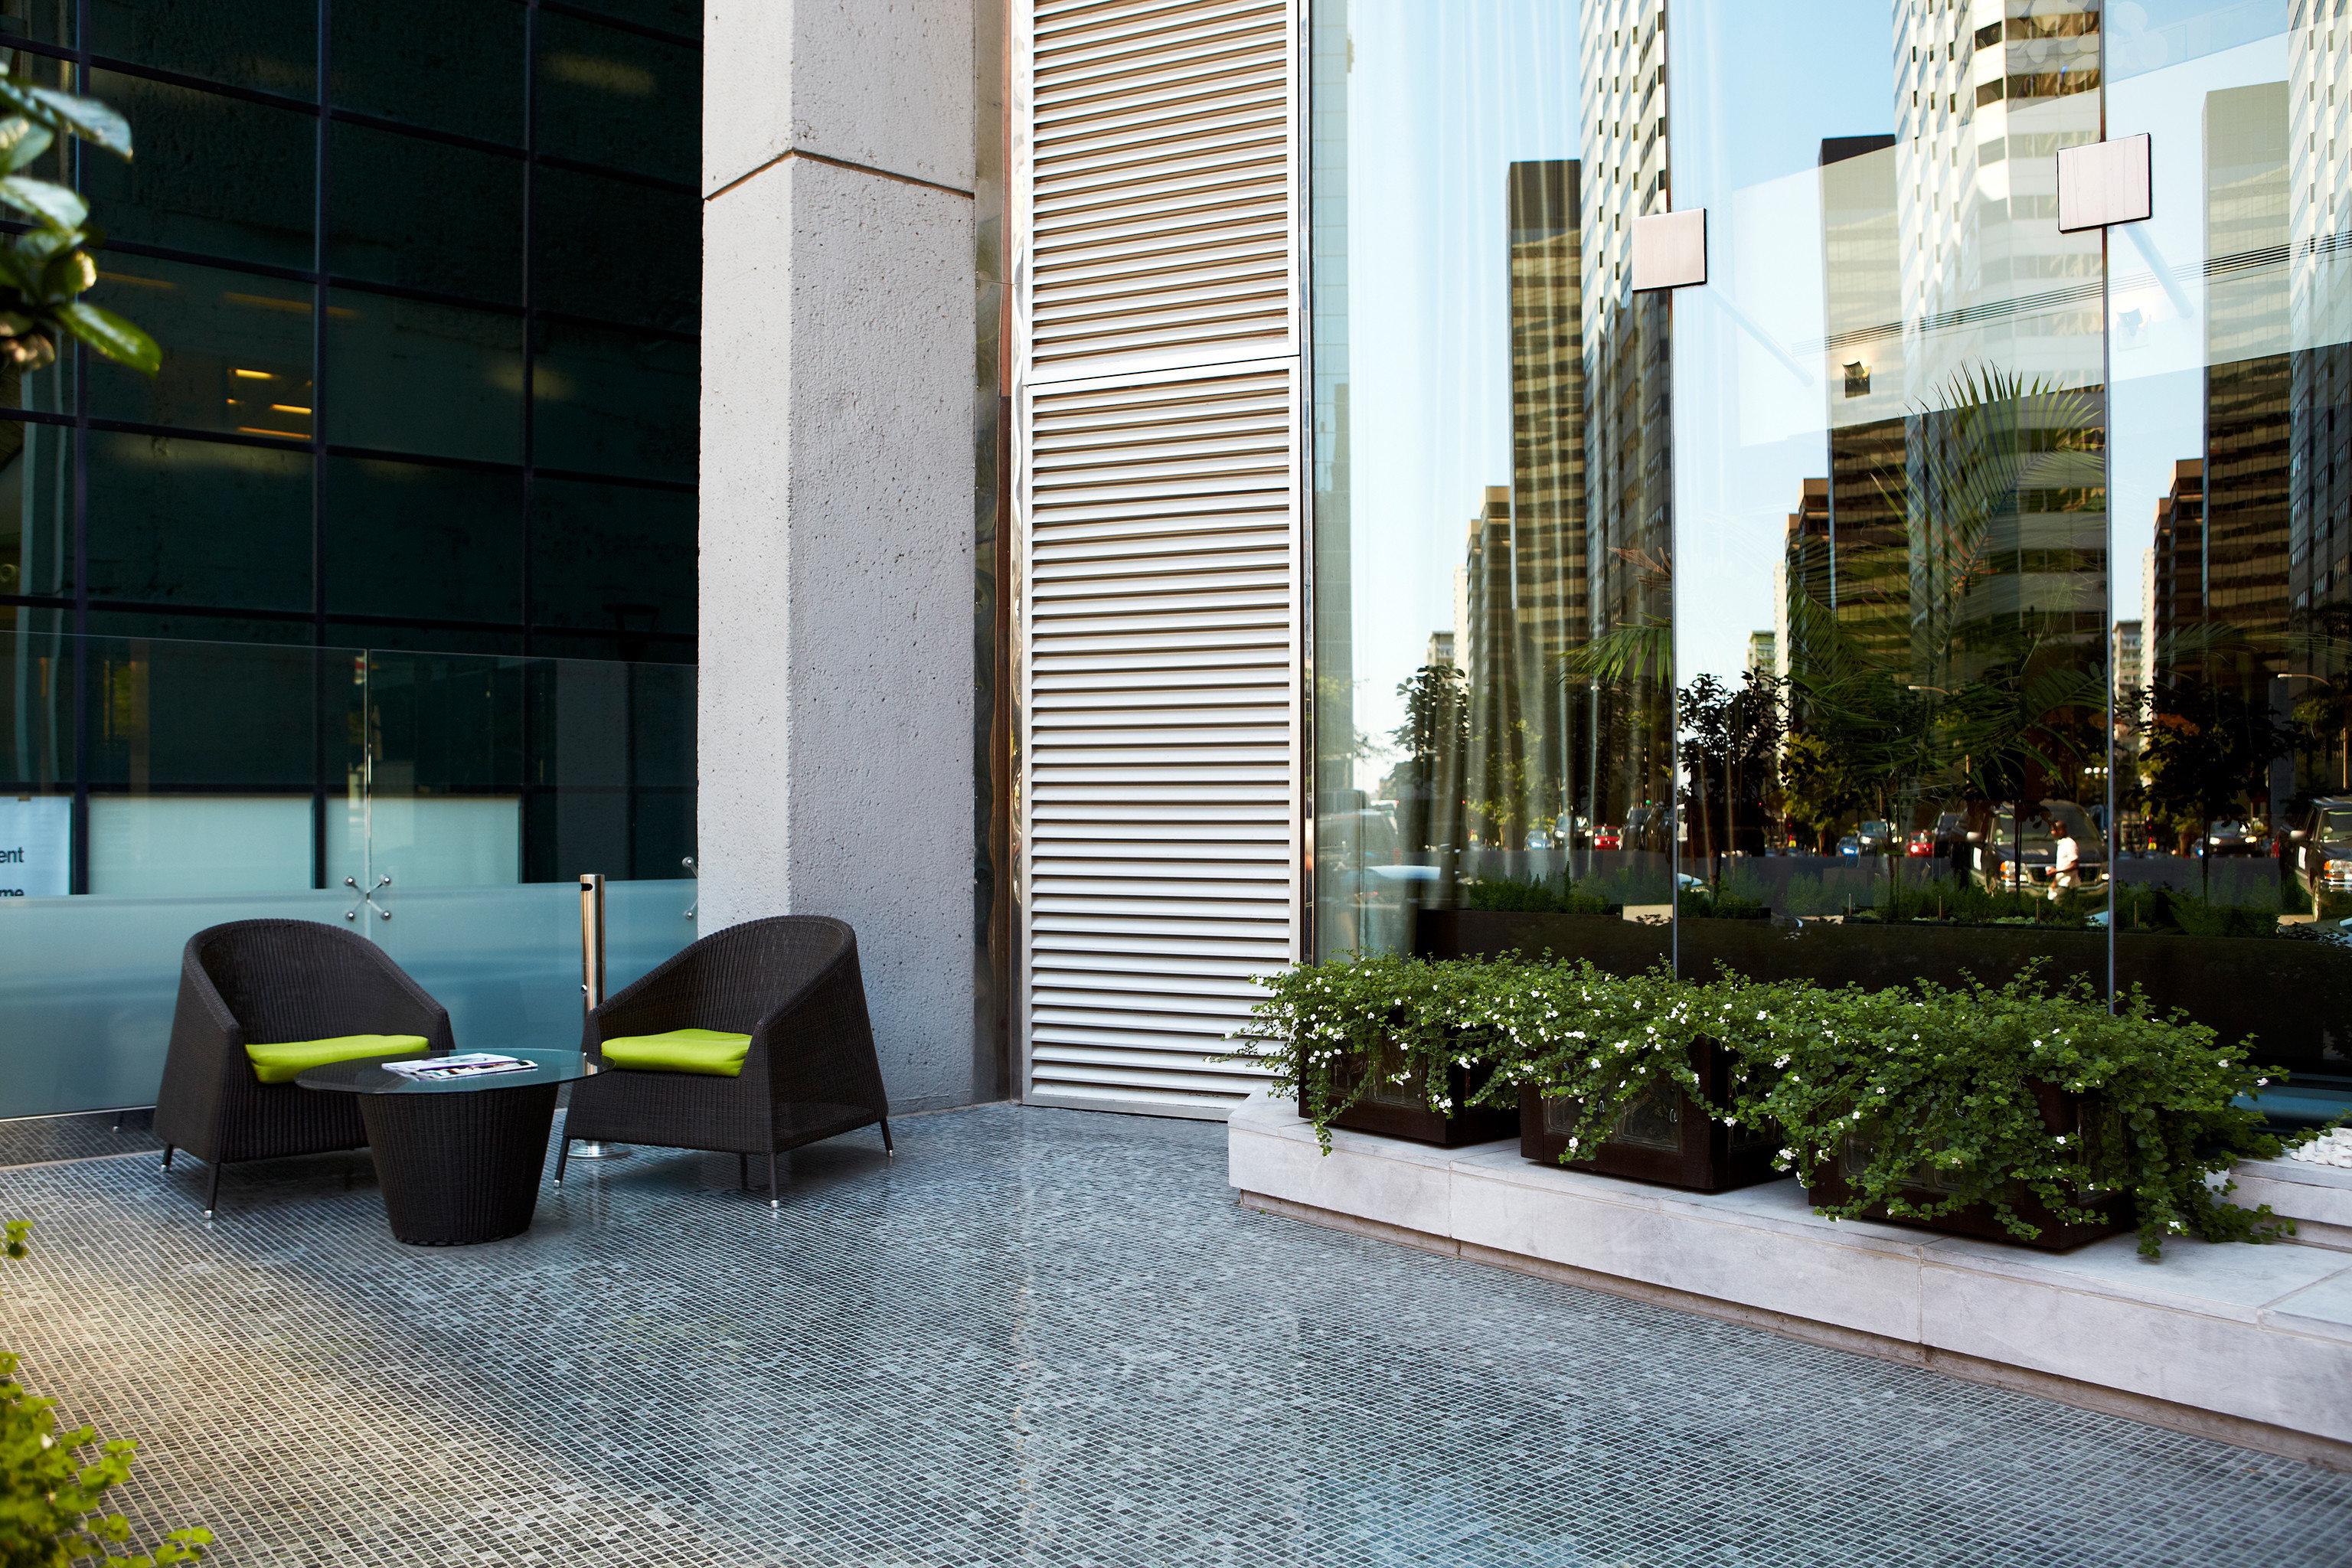 Architecture Boutique Buildings City Modern Patio Scenic views property condominium home Courtyard